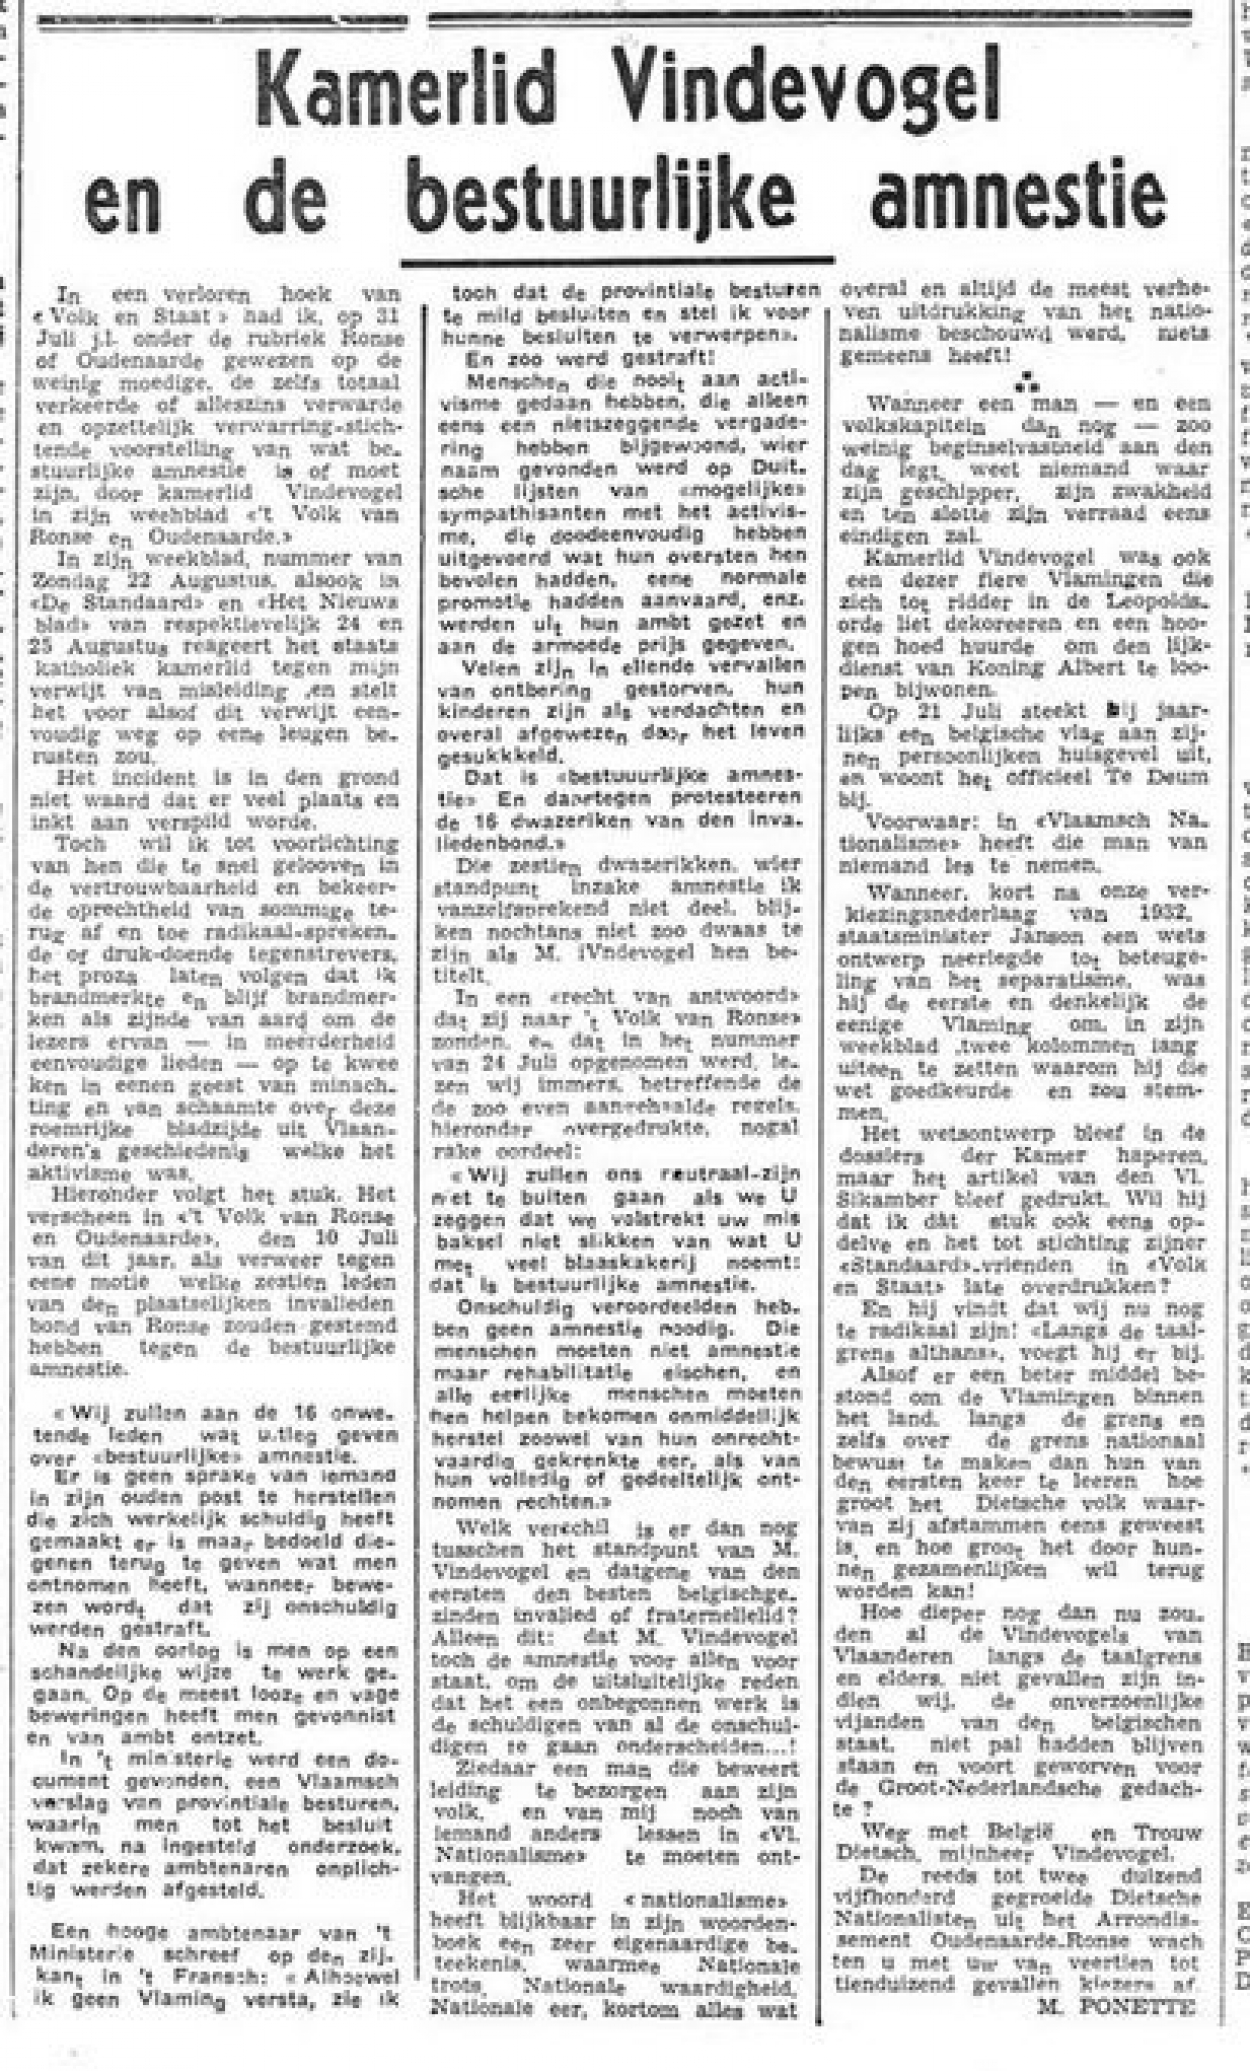 volk-en-staat-29-8-1937(4).jpg